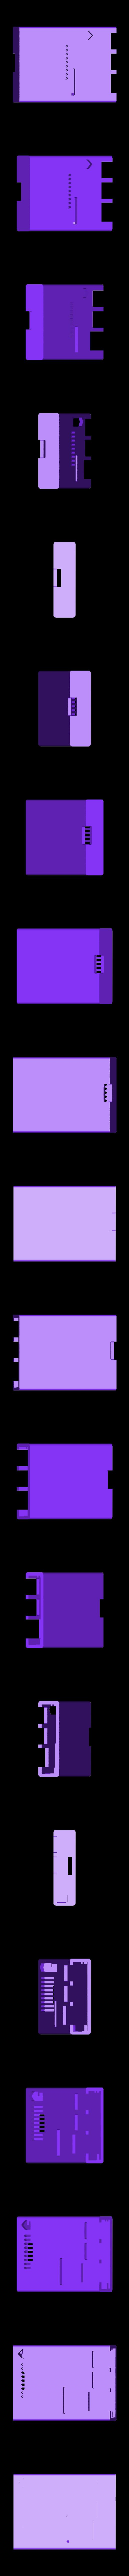 Raspberry_Pi_3B%2B_Sleeve.Sleeve.Body1-HDMI-Headphone-Jack-Camera-Port-GPIO.stl Télécharger fichier STL gratuit Raspberry Pi 3B+ Sleeve • Design à imprimer en 3D, Wilko